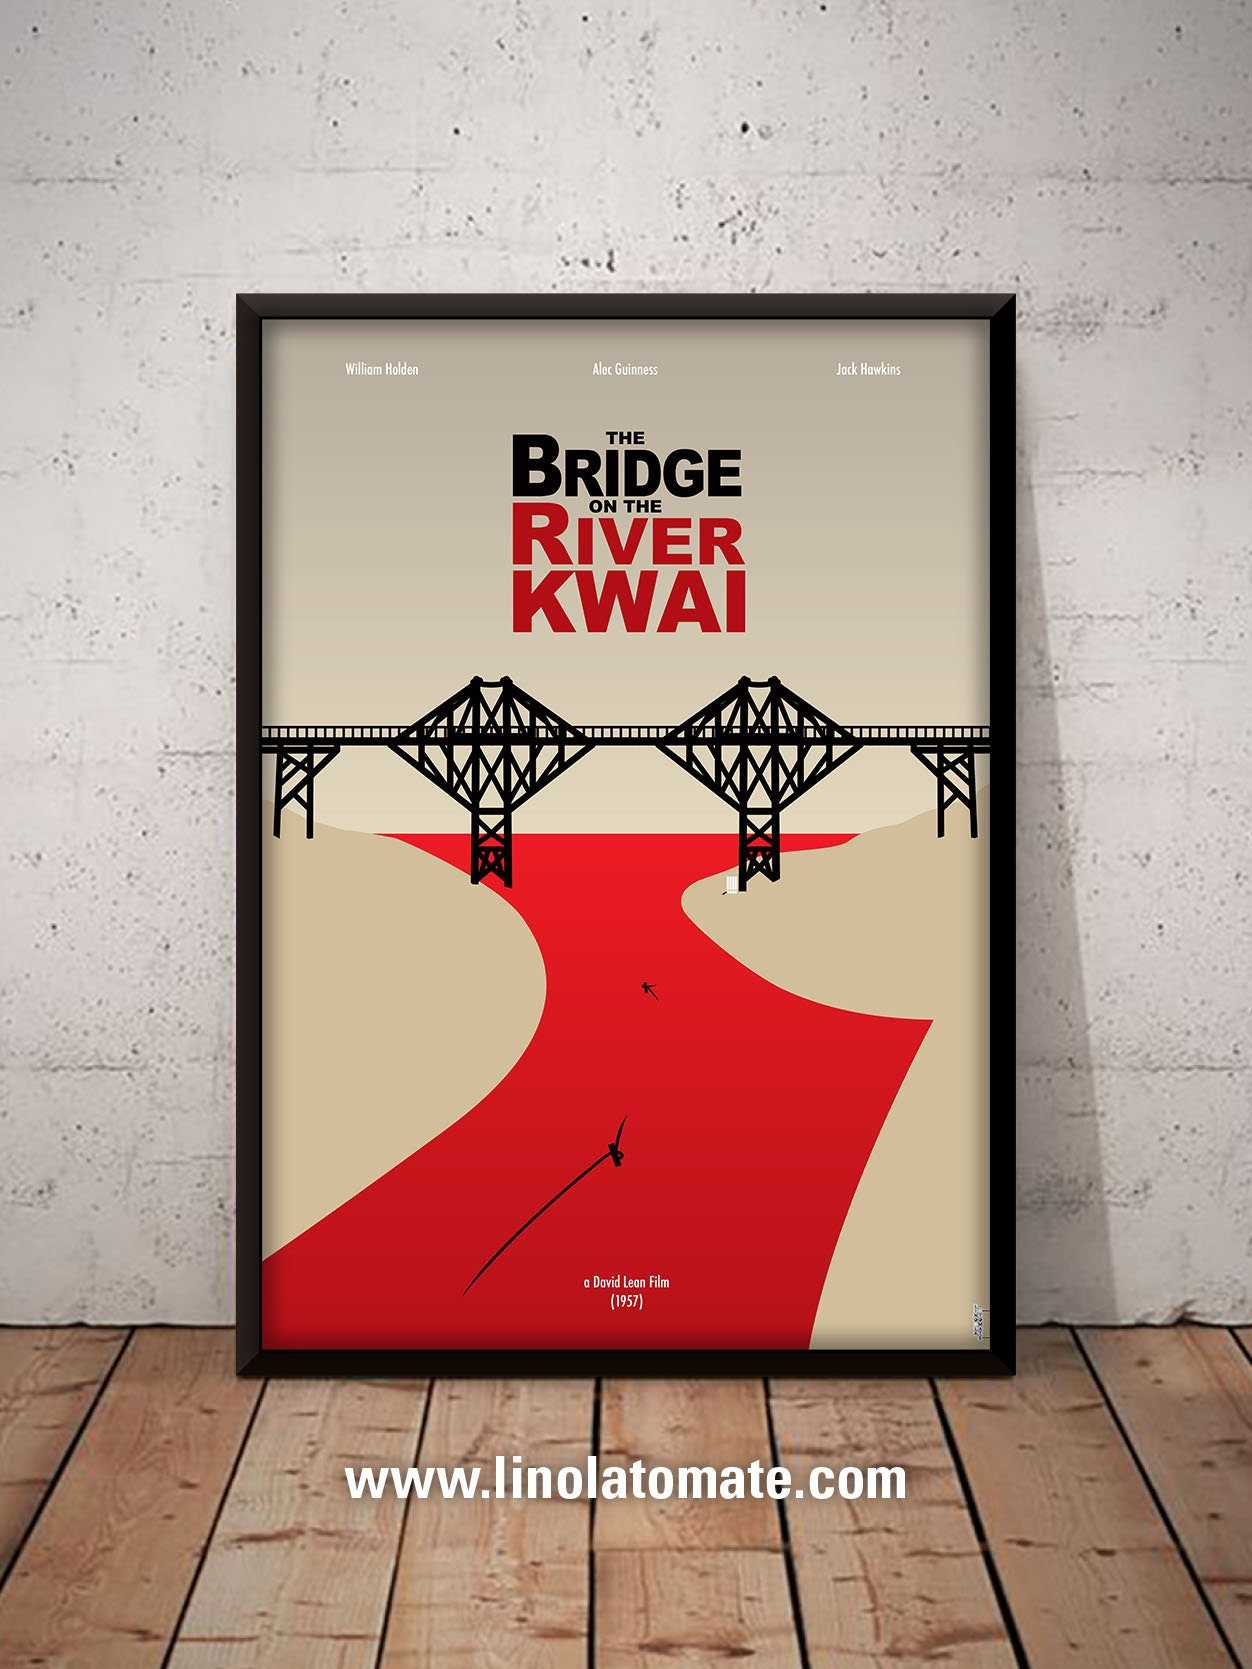 Le Pont De La Rivi 200 Re Kwa 207 The Bridge On The River Kwai